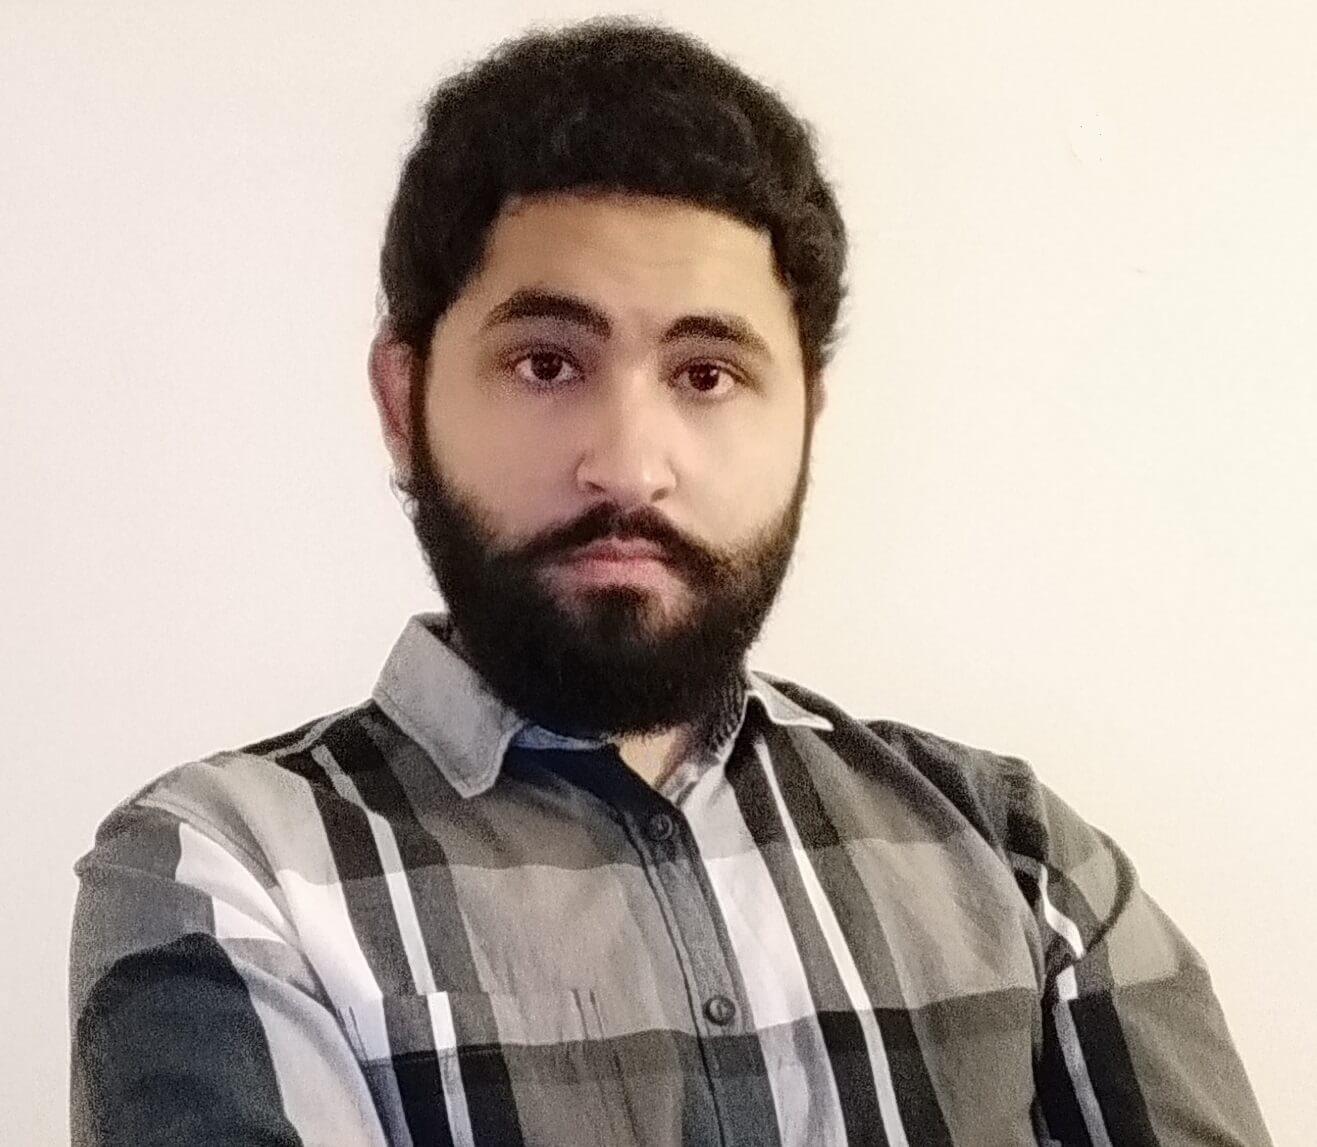 Dr. Hamza Youssef Ismail